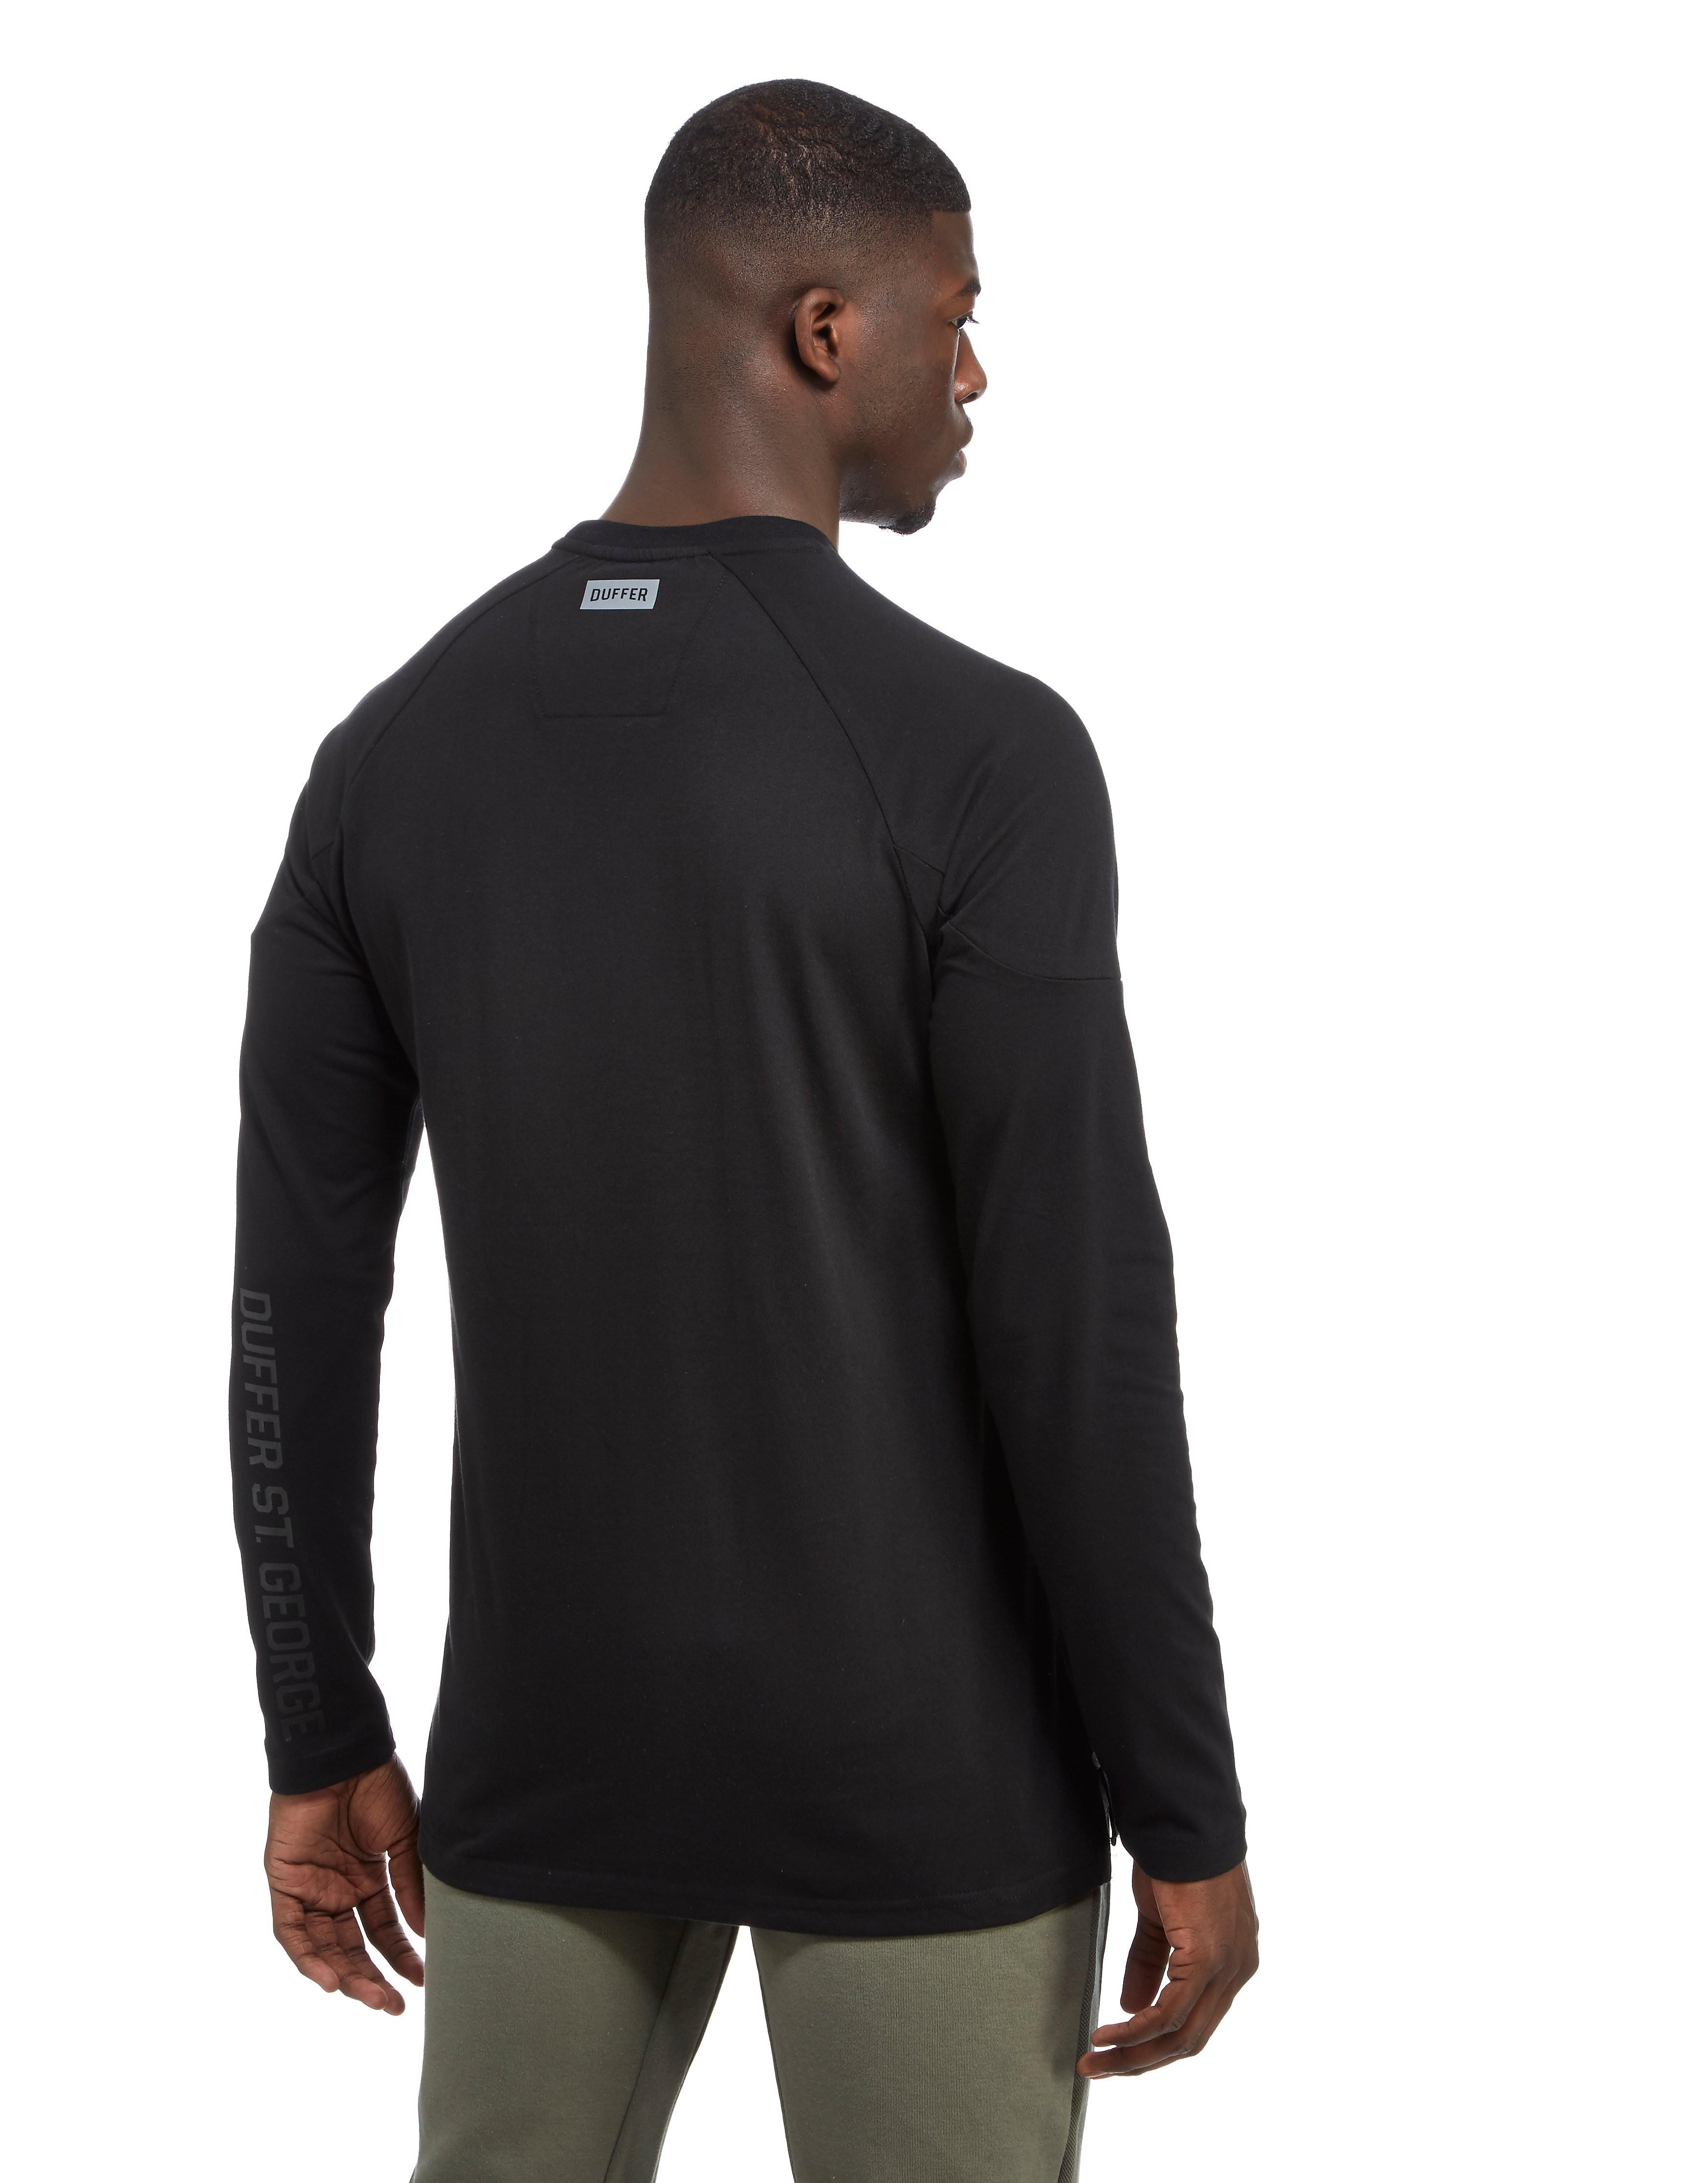 Duffer of St George Black Label Longsleeve T-Shirt